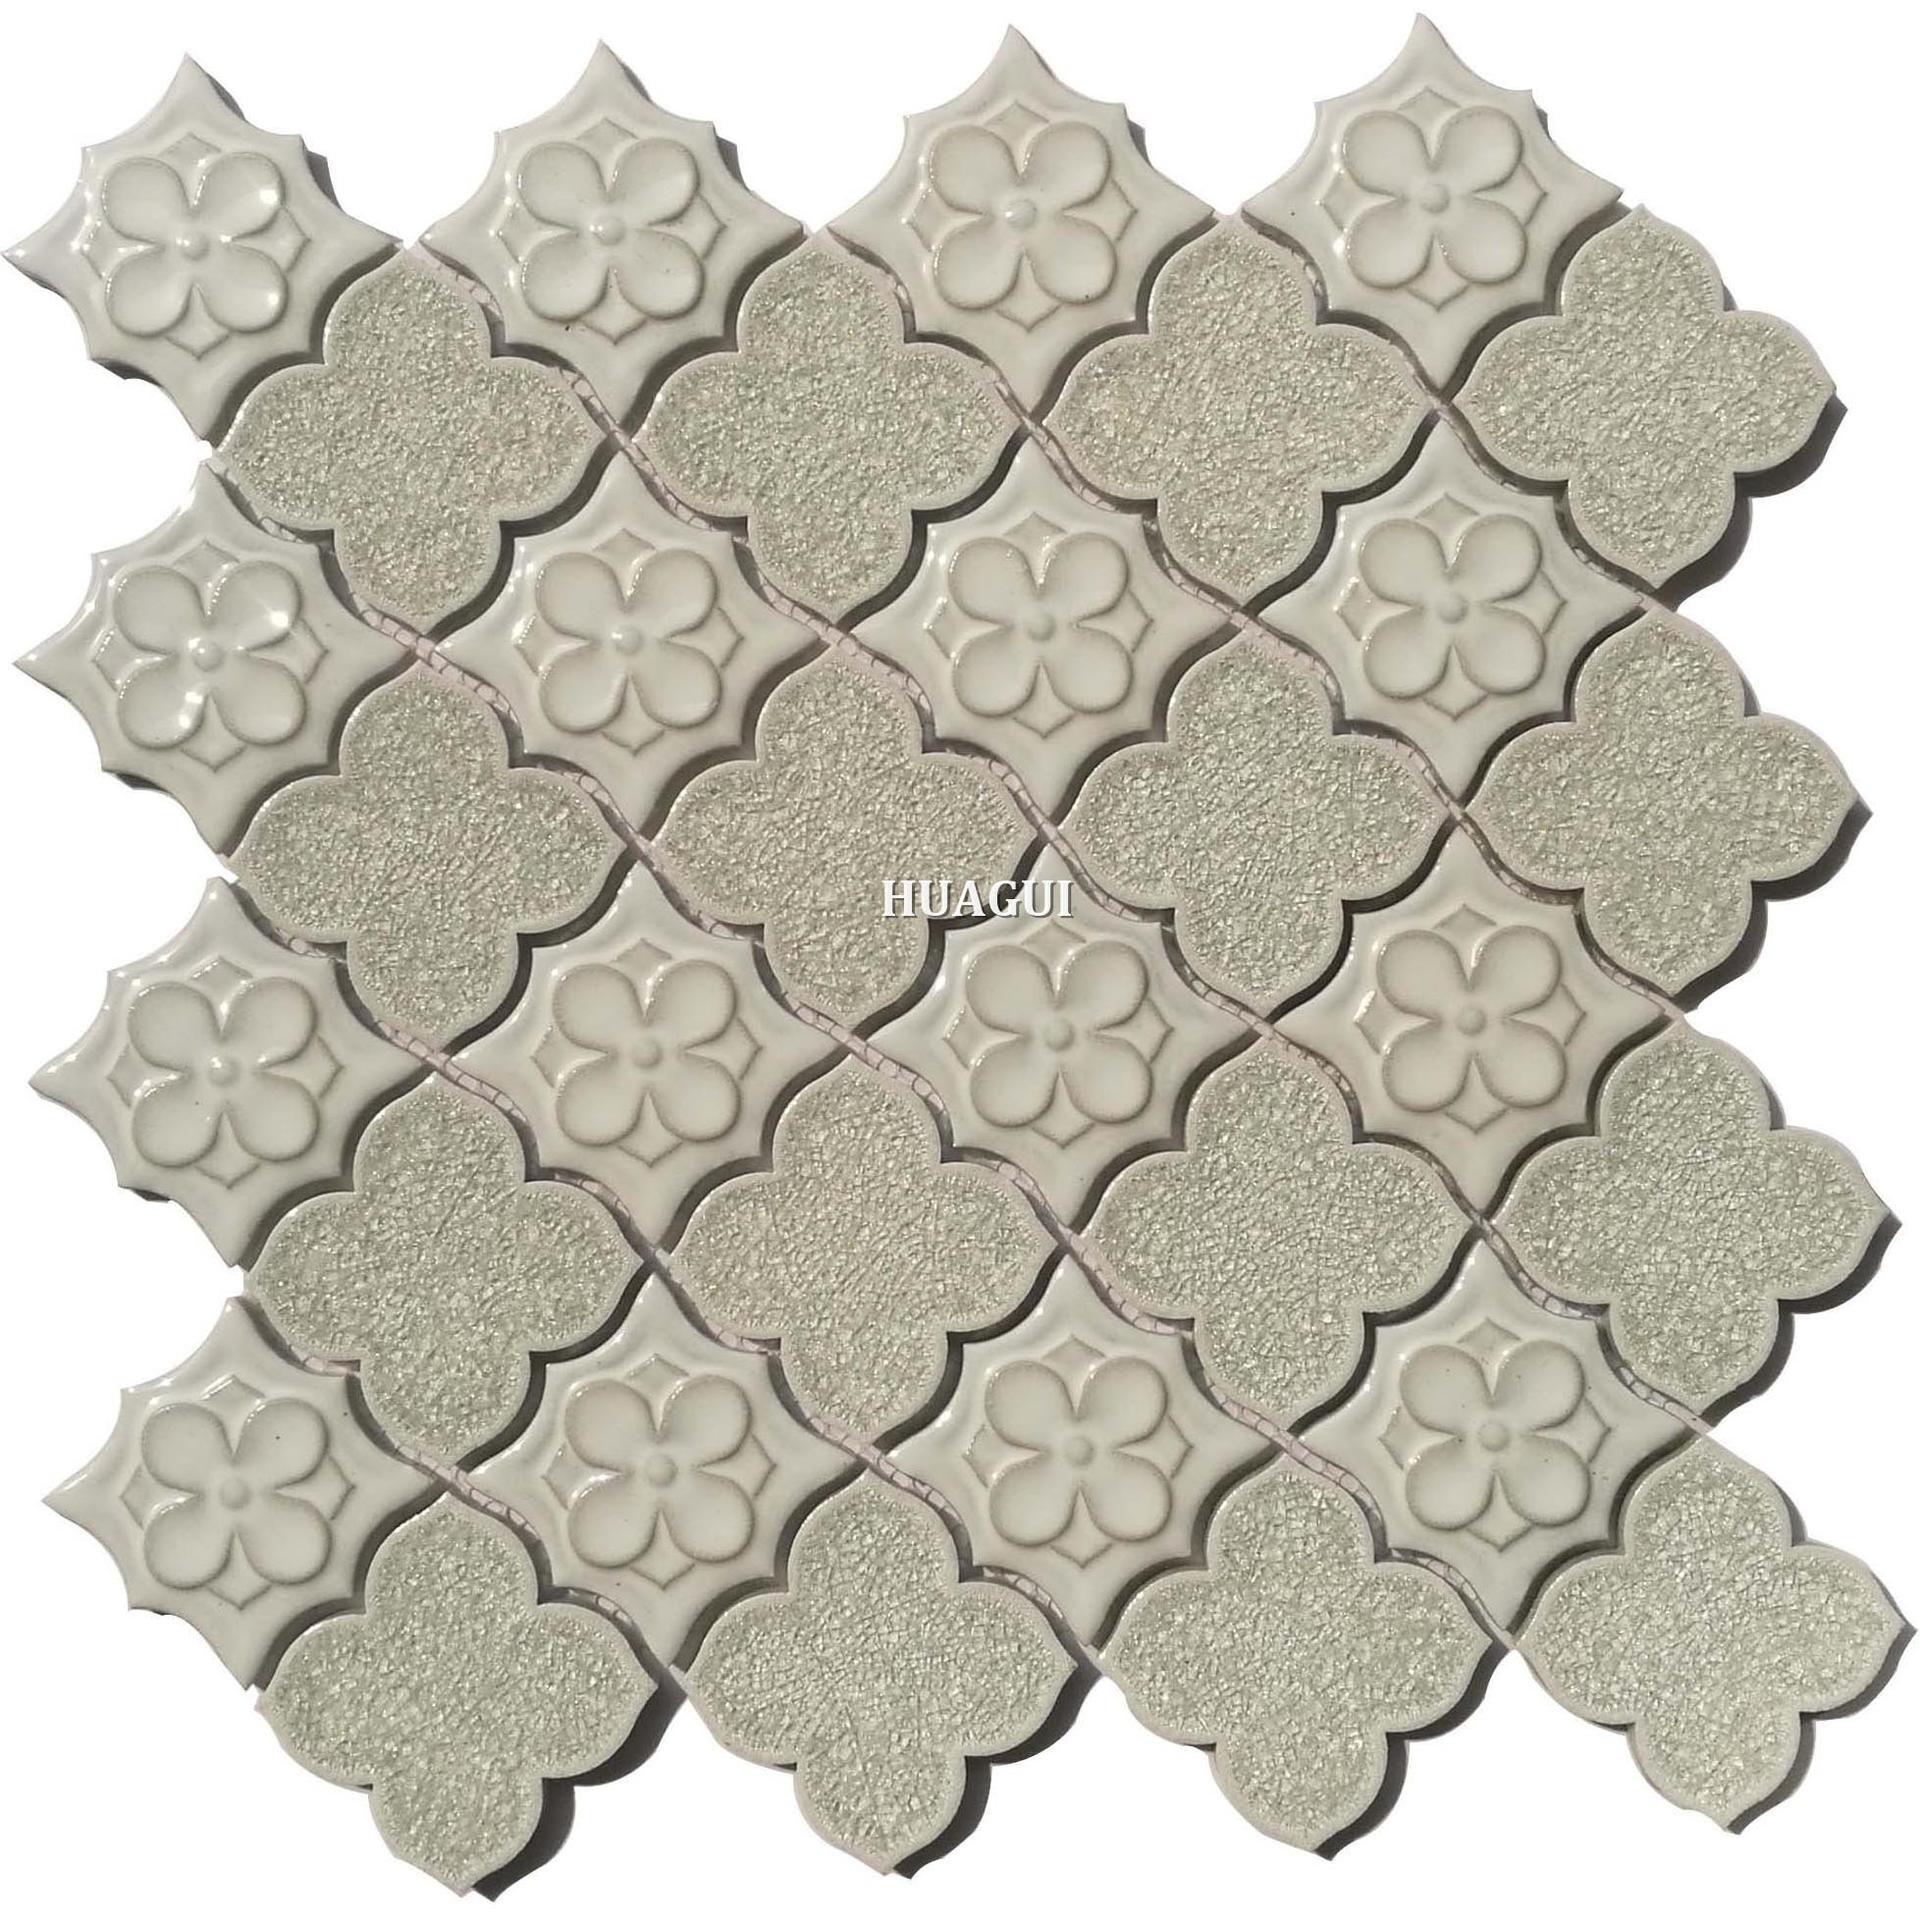 Elegant America style white flower ice cracked ceramic mosaic tile design idea